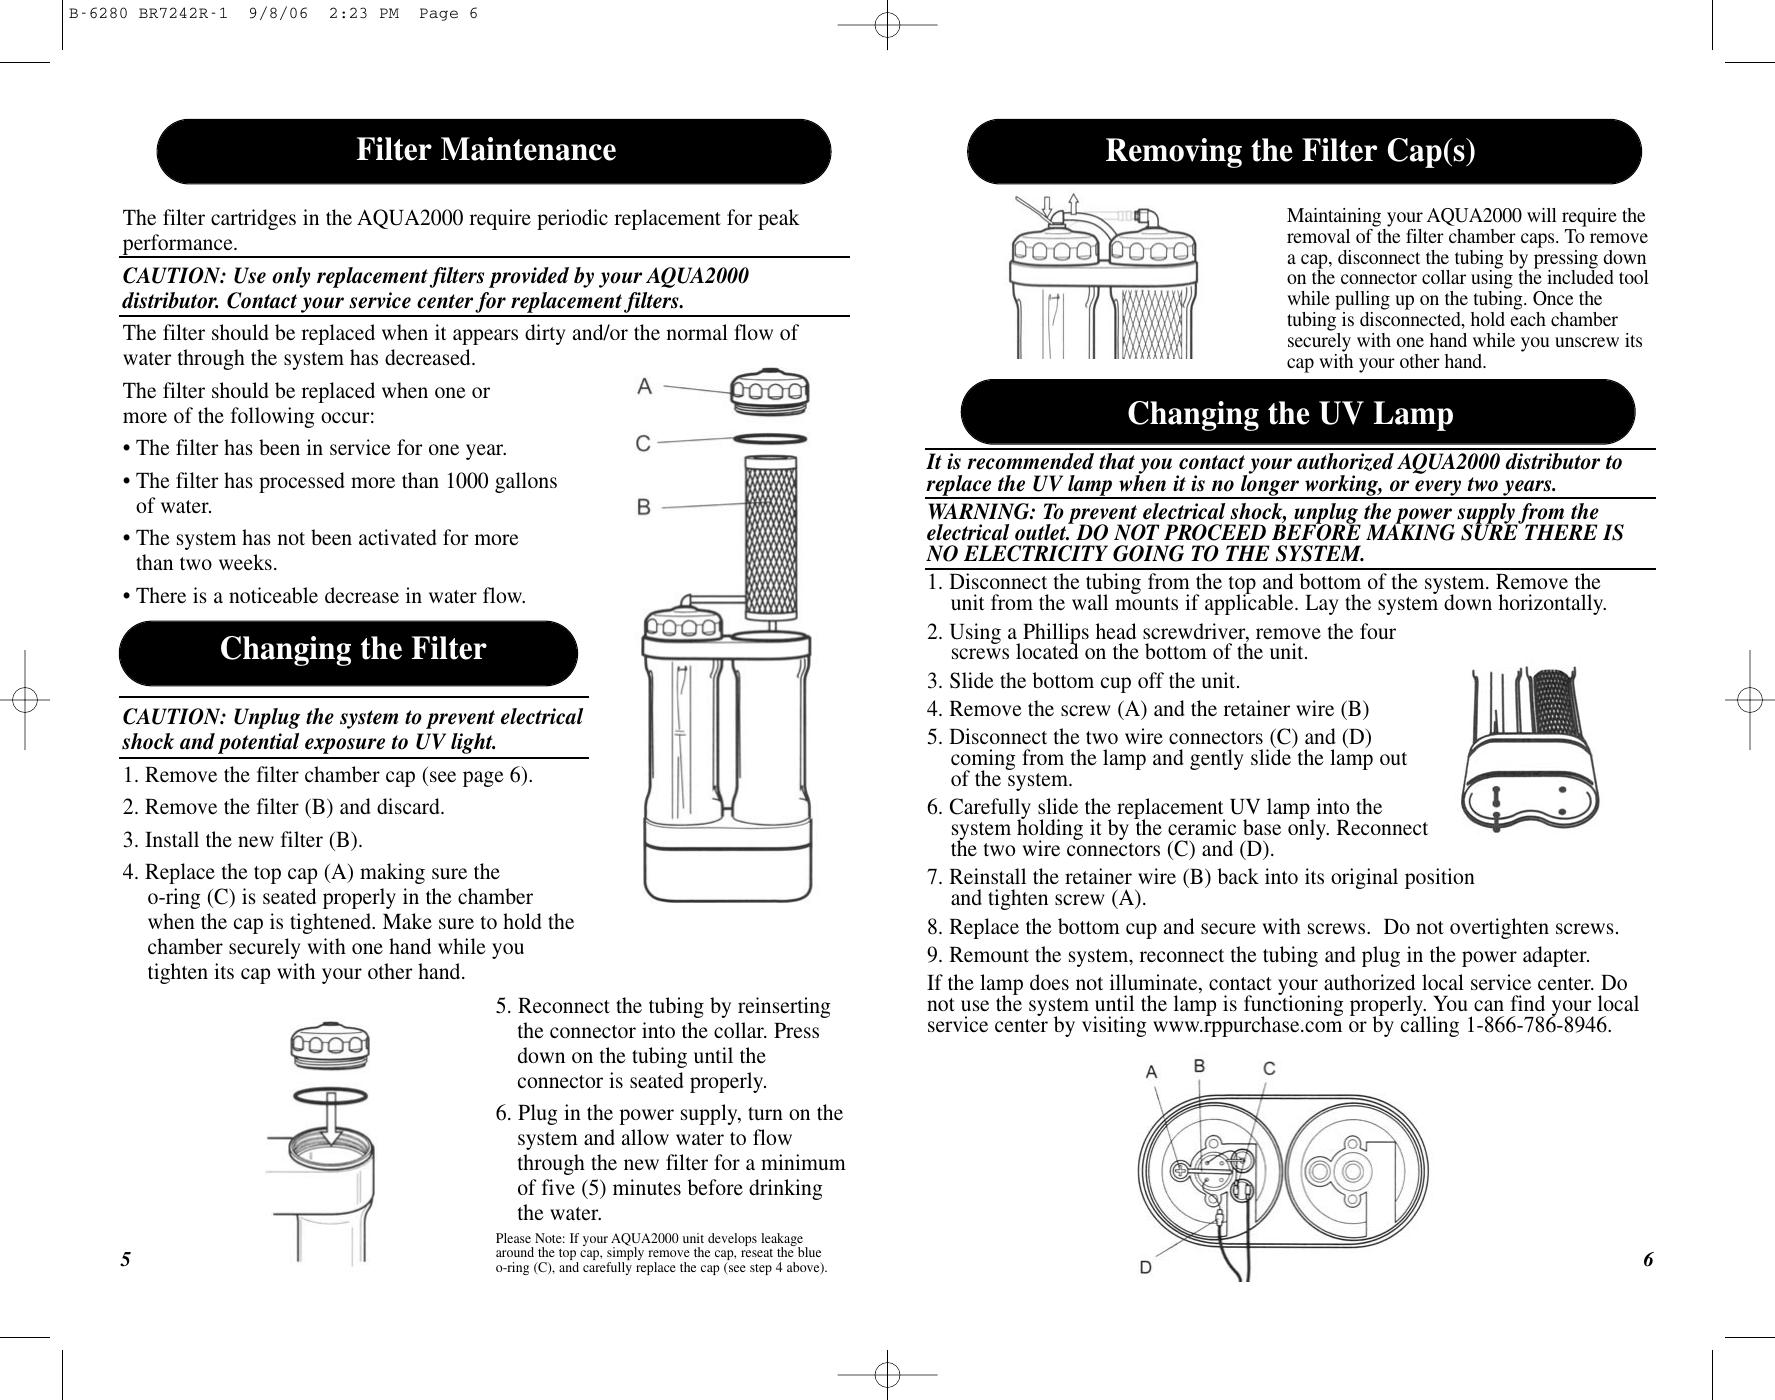 Puratron Products Aqua2000 Users Manual B 6192 BR6908R 1